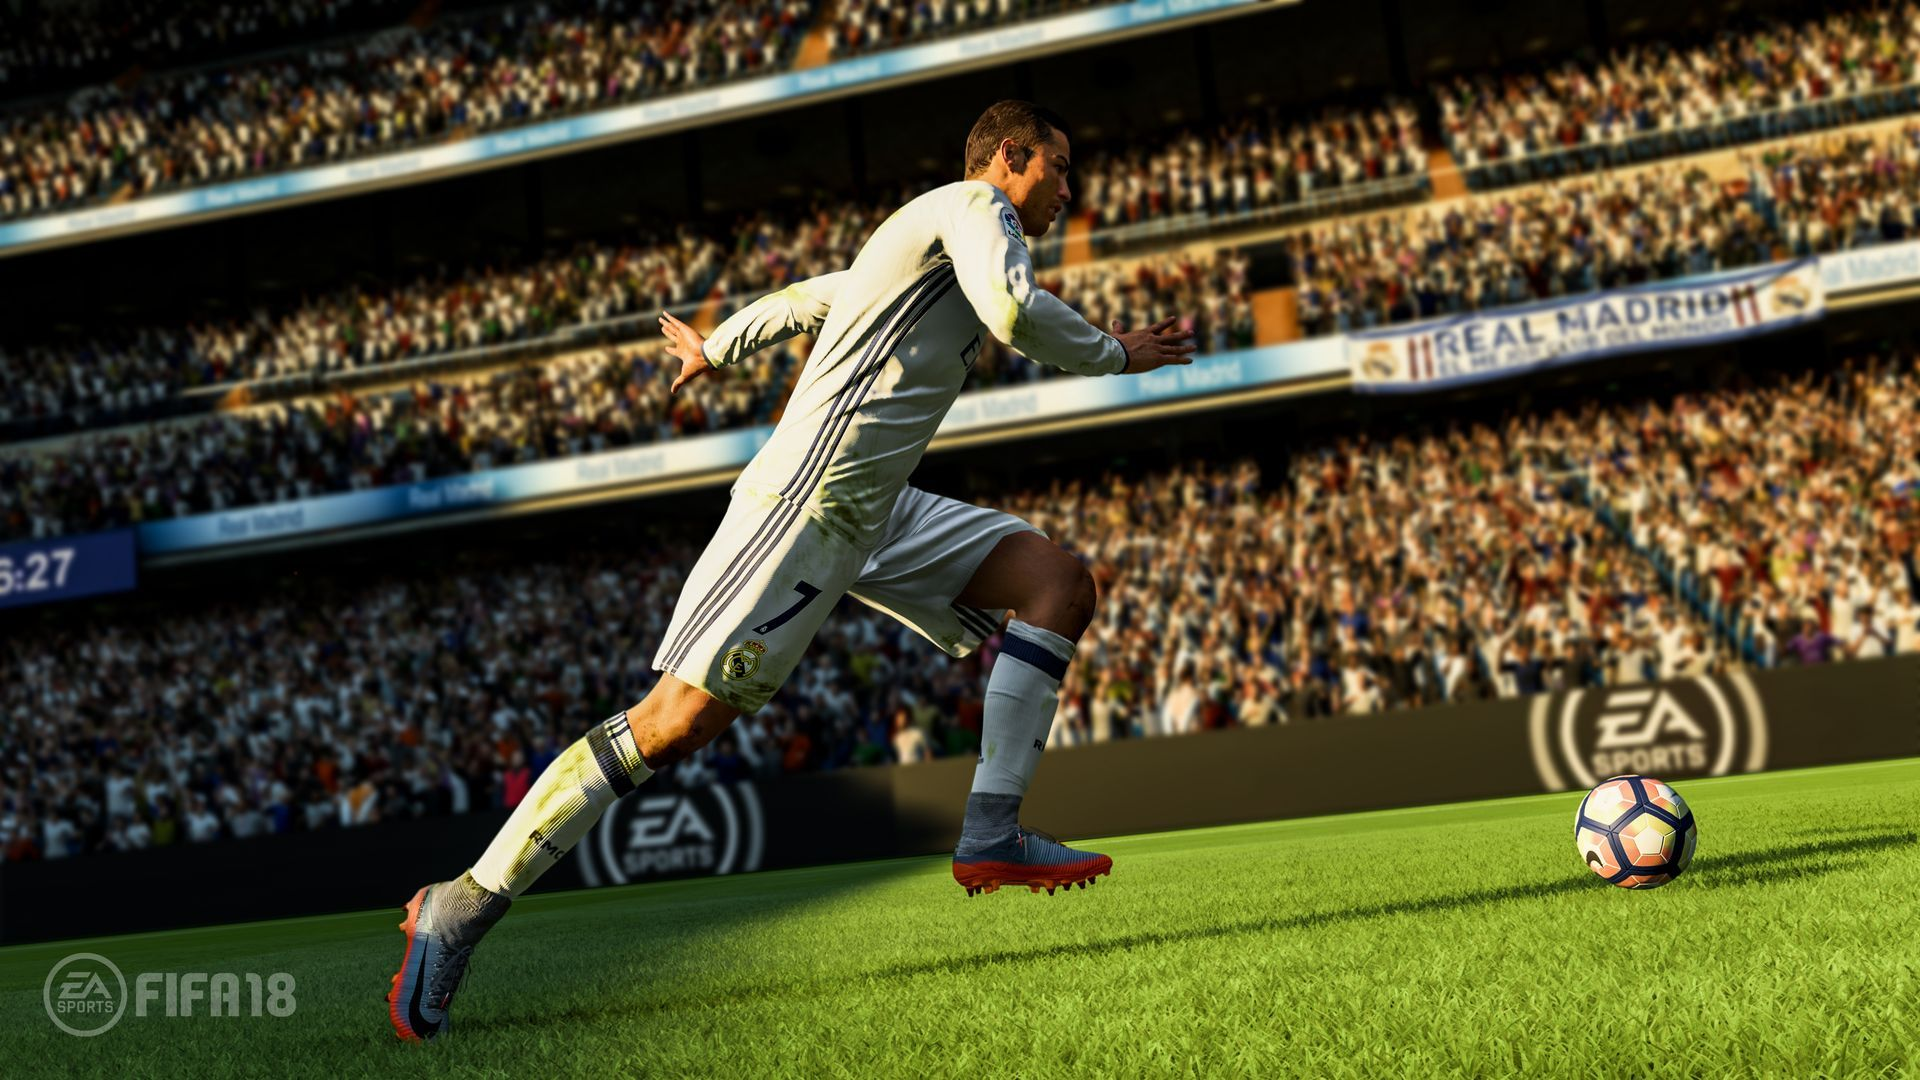 FIFA 18 (PC) - 3